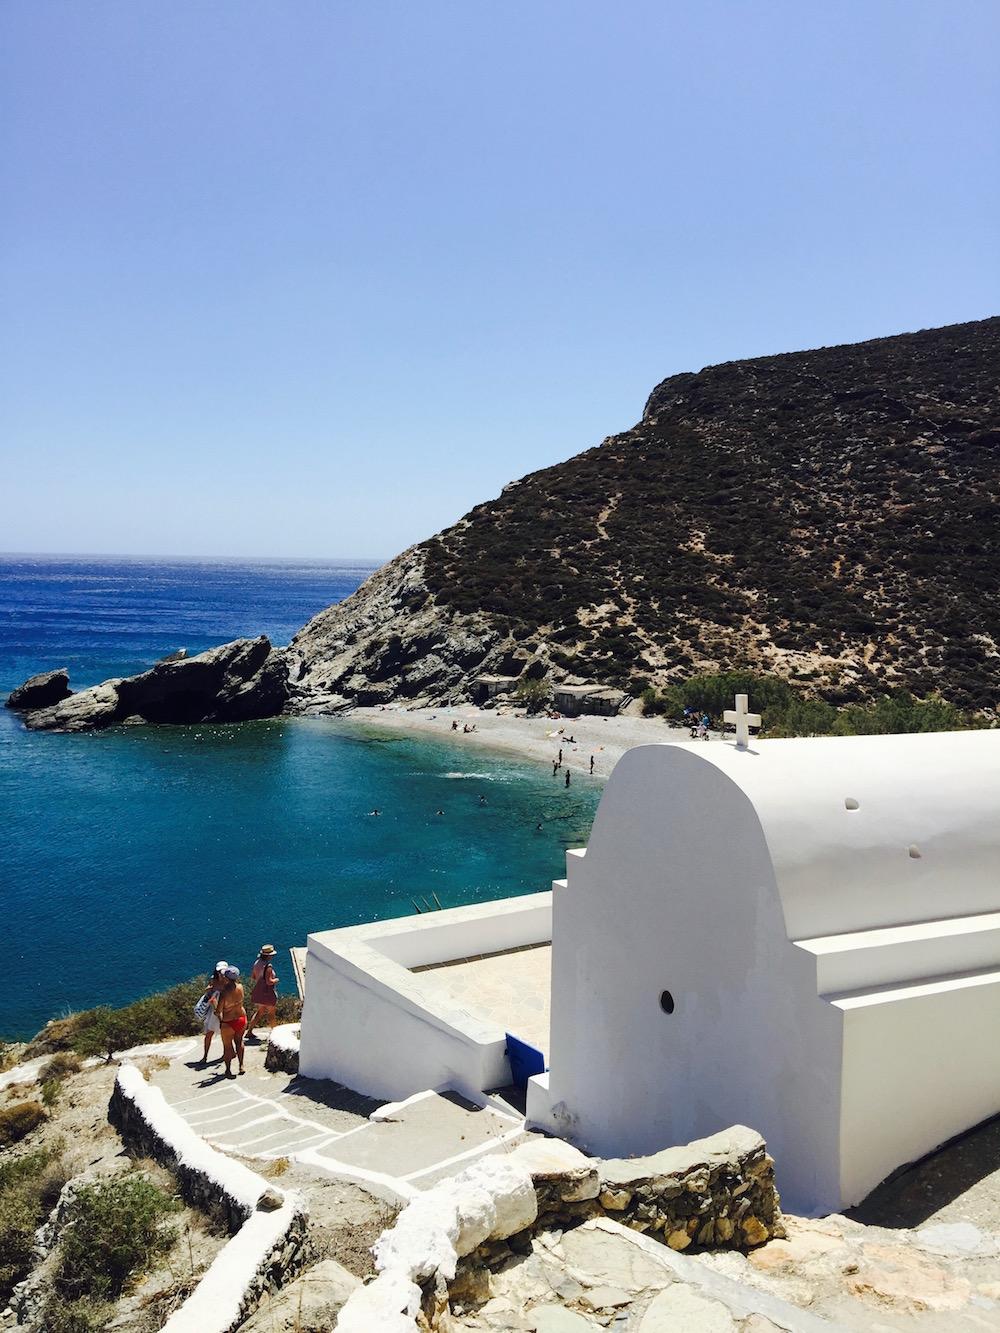 Crique Agios Nikolaos, Folegandros